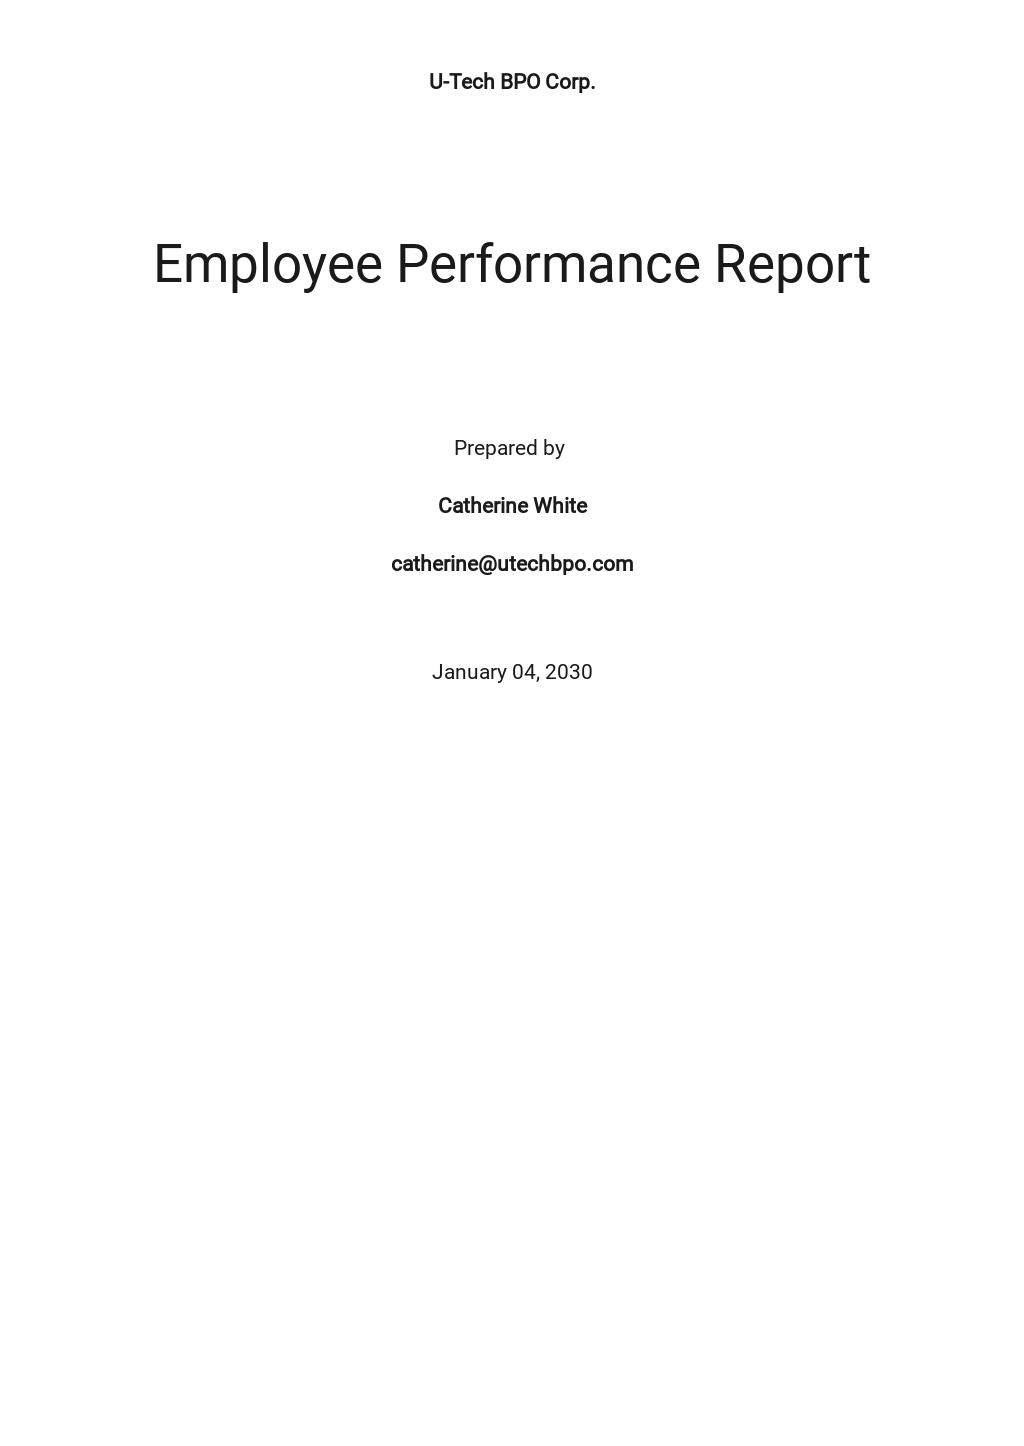 Employee Performance Report Template.jpe